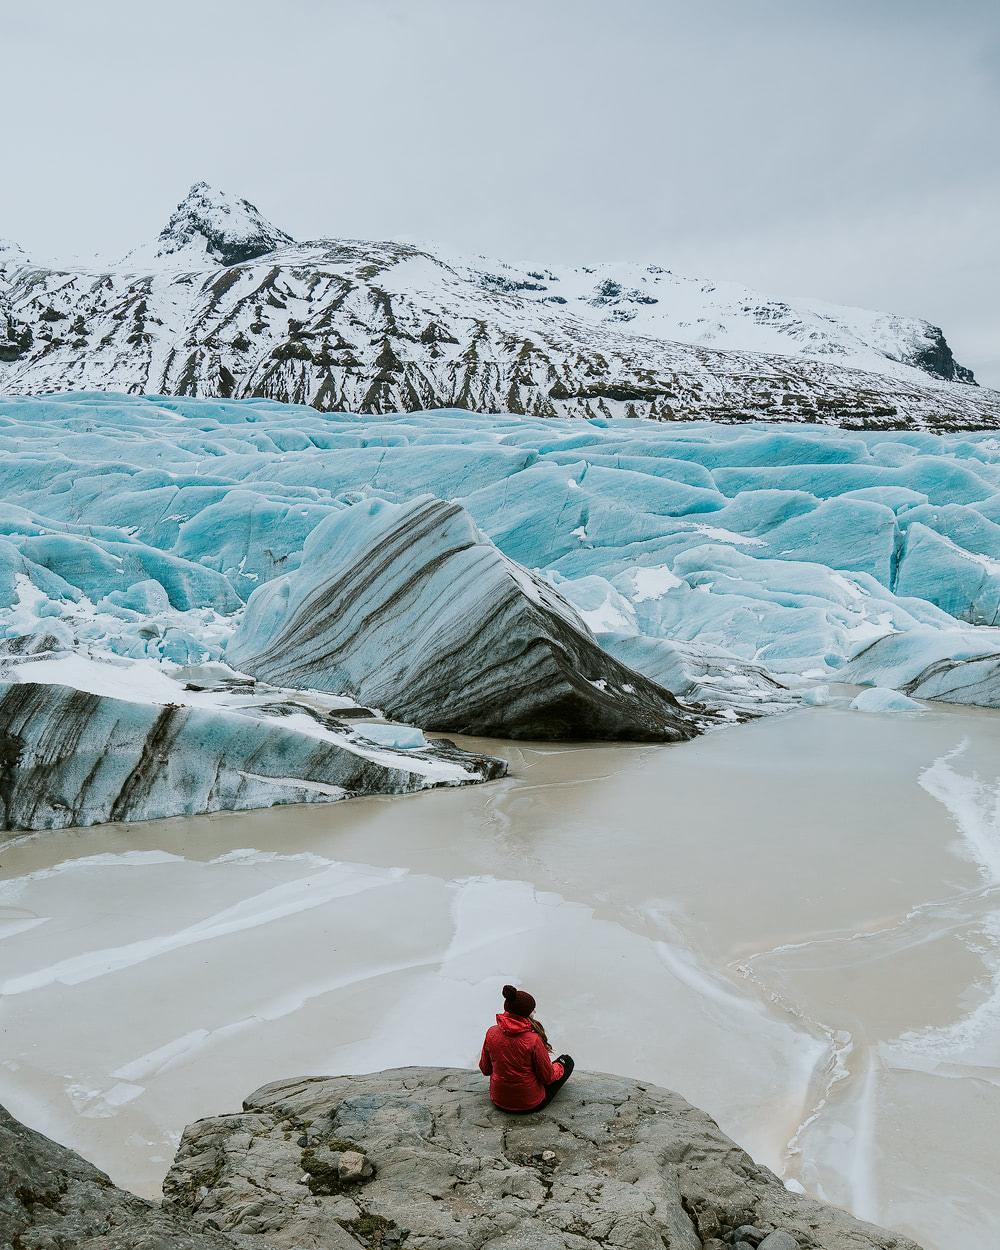 Iceland, Svinafellsjokull - Renee Roaming